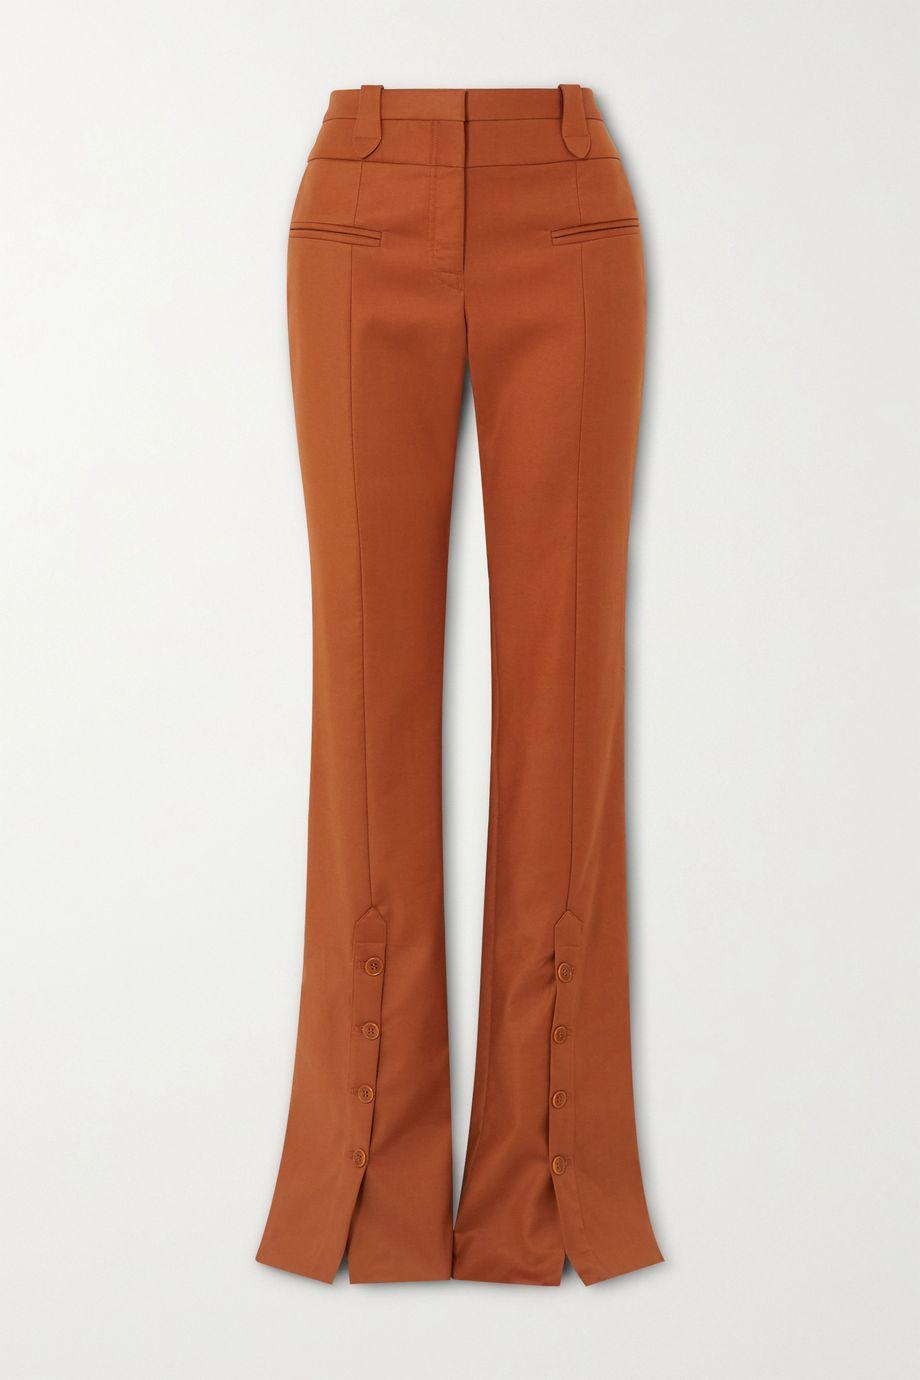 Altuzarra Ned cotton-blend twill flared pants